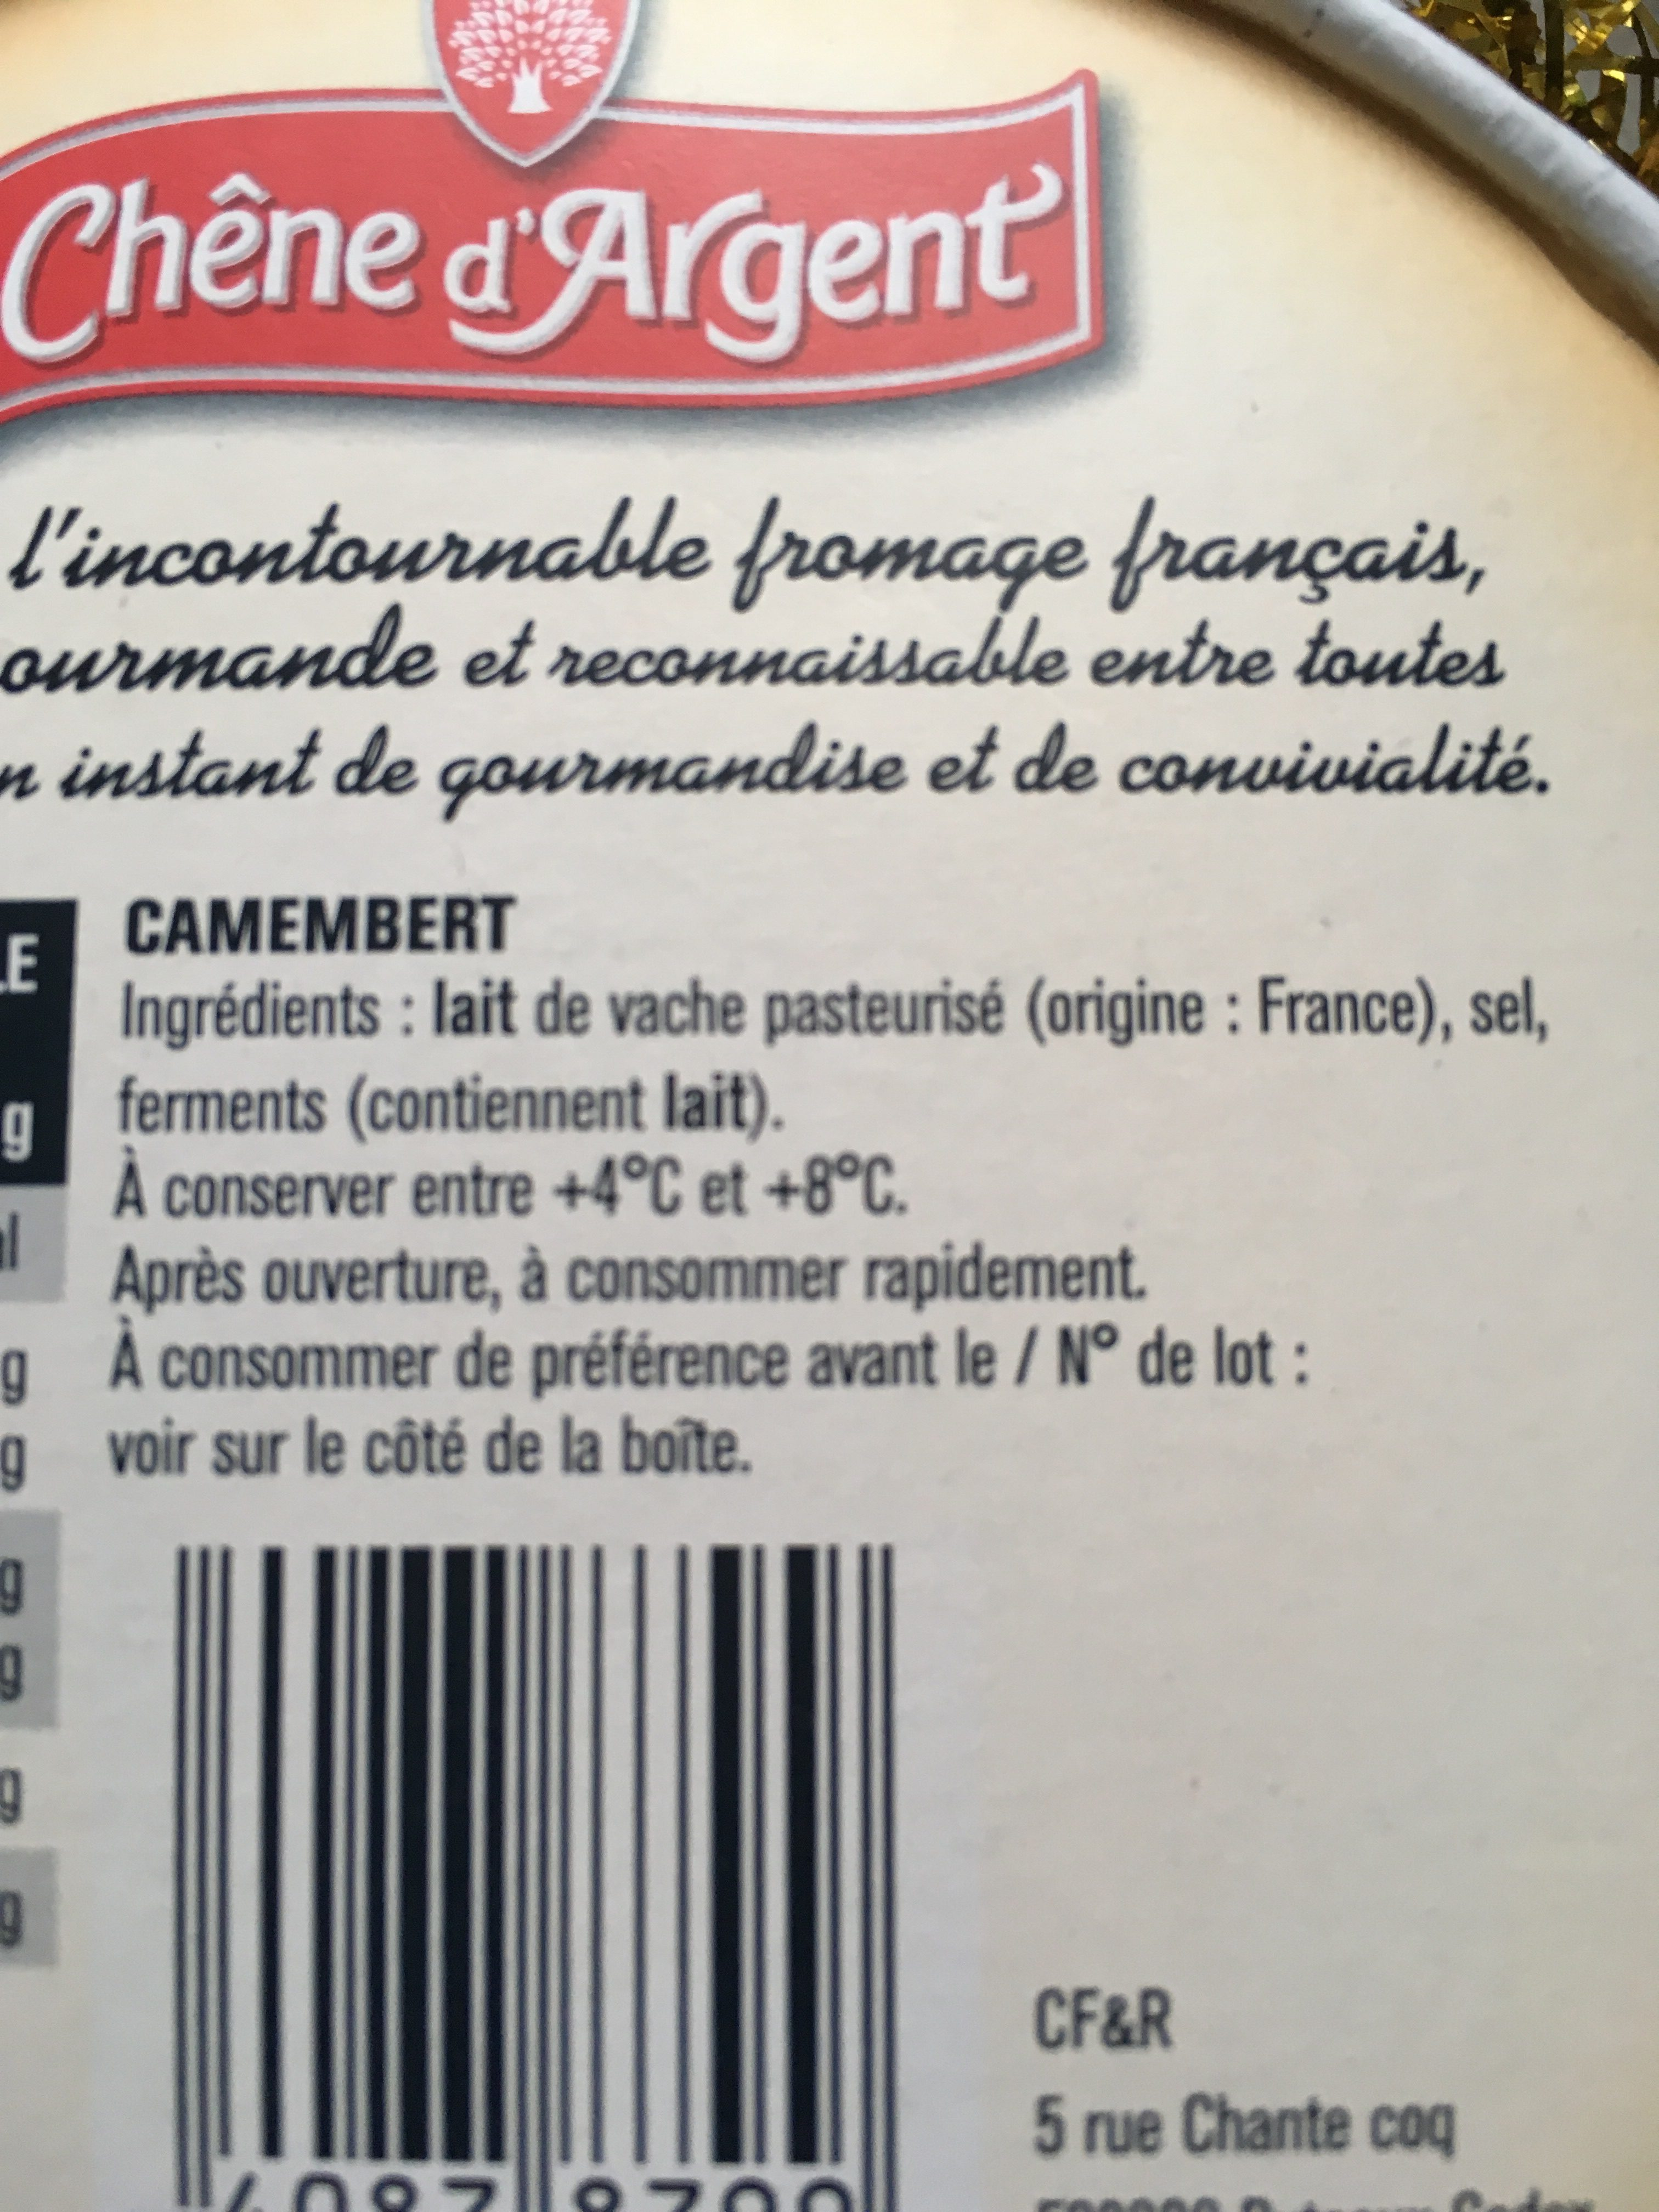 Chêne d'Argent Camembert - Ingrédients - fr